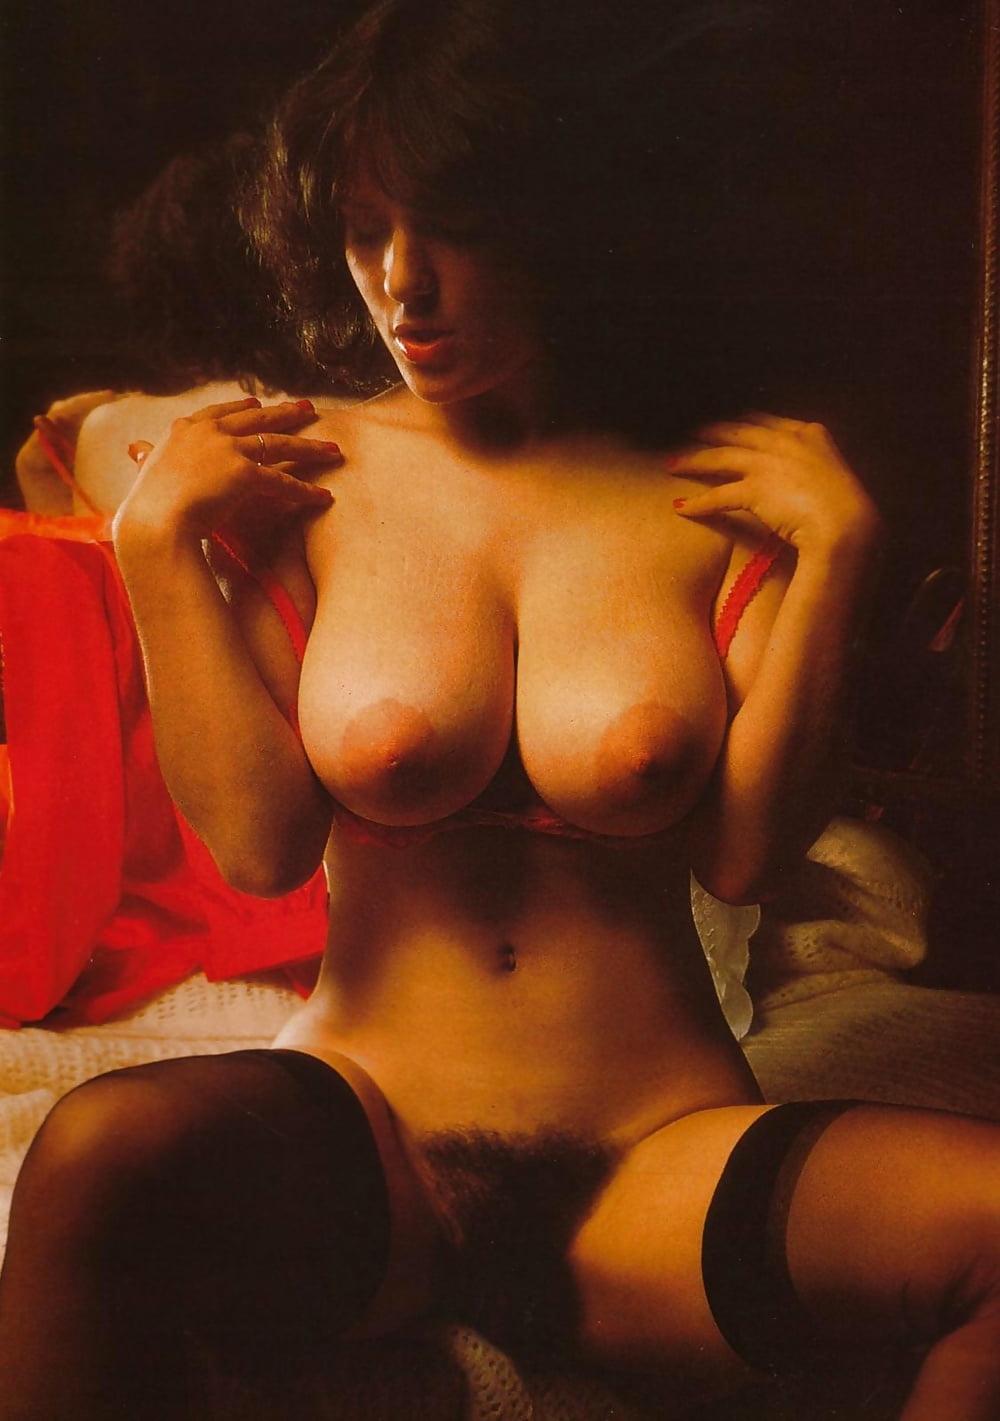 Jennifer Eccles Busty British Vintage Pornstar From The 70 -7849